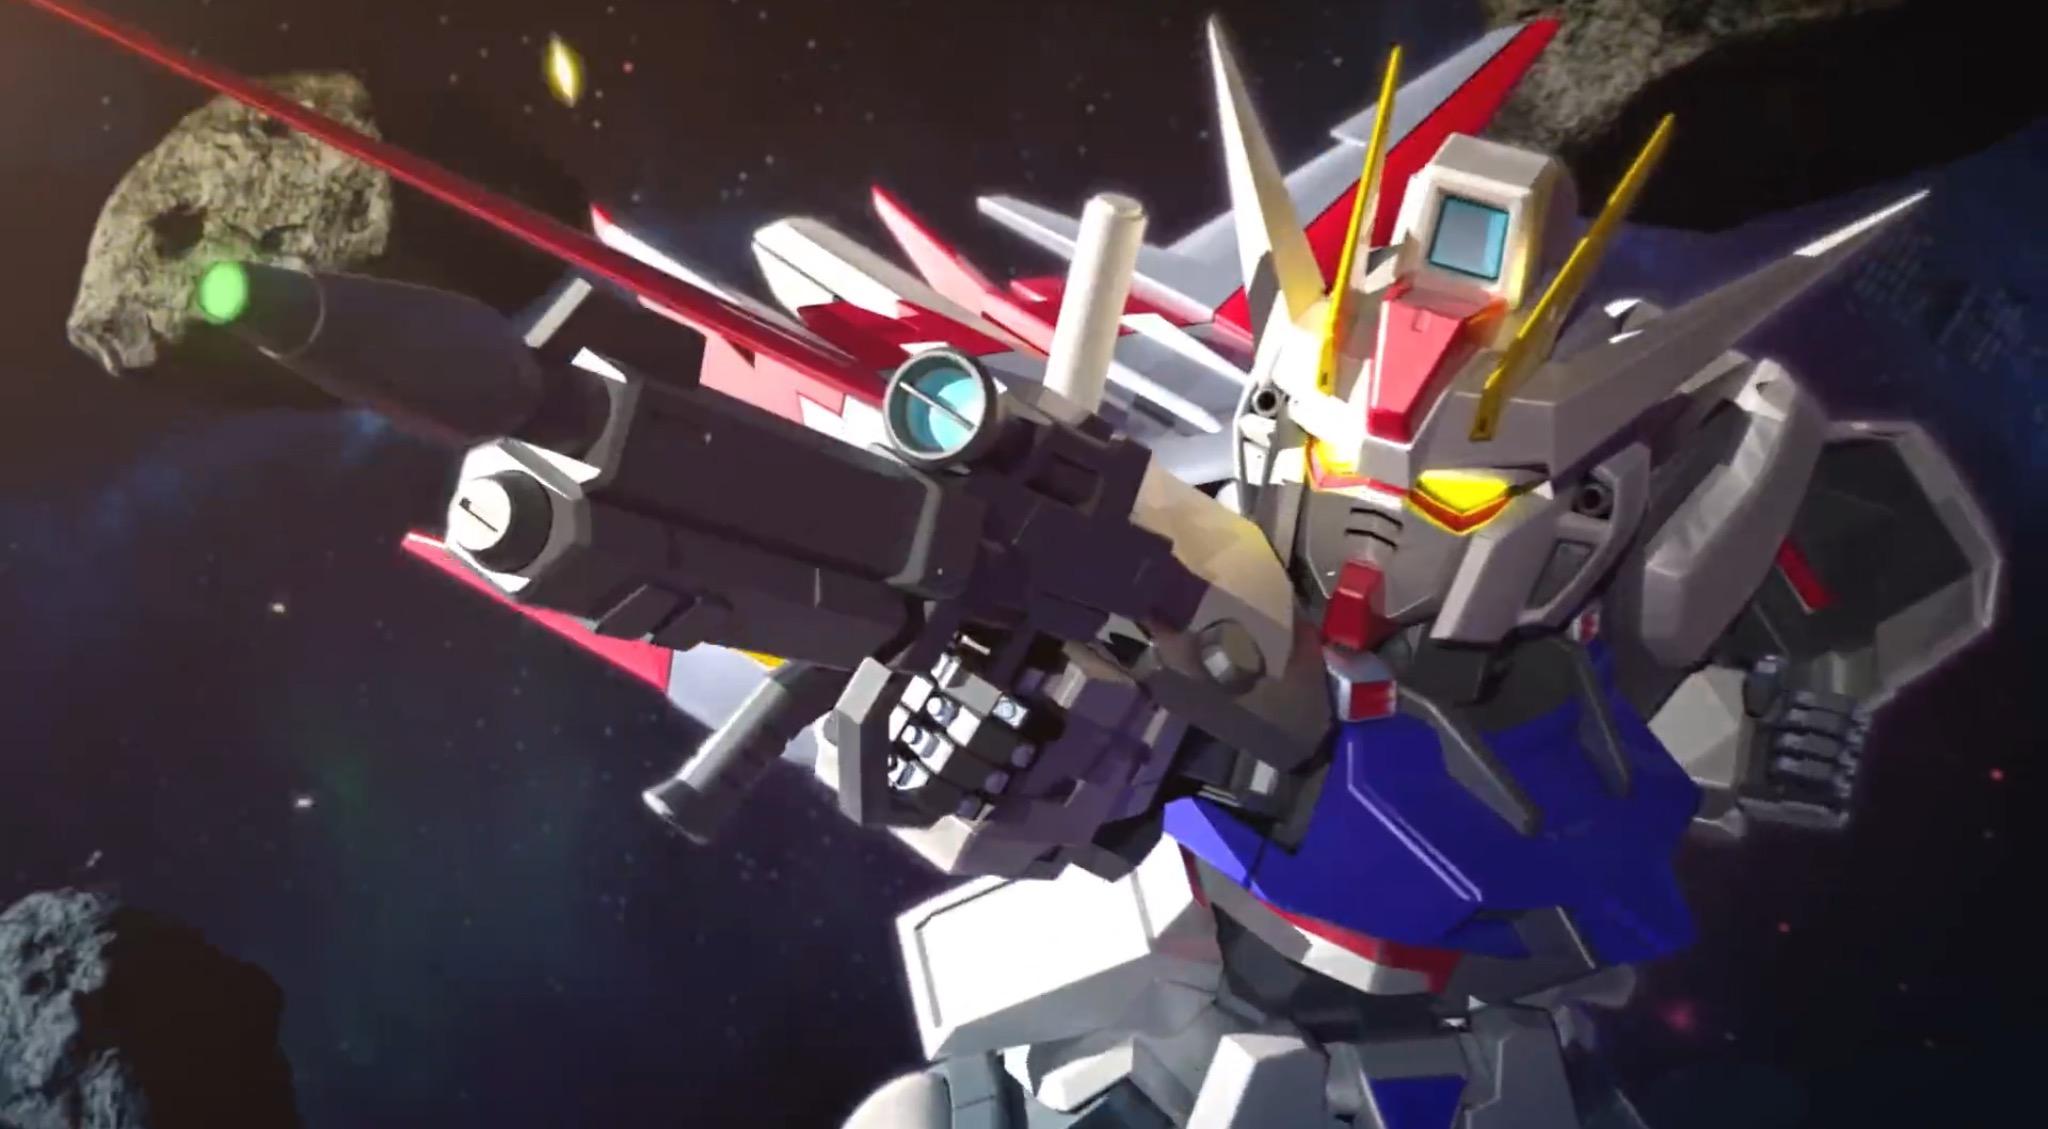 SD Gundam G Generation Cross Rays 3172019 2